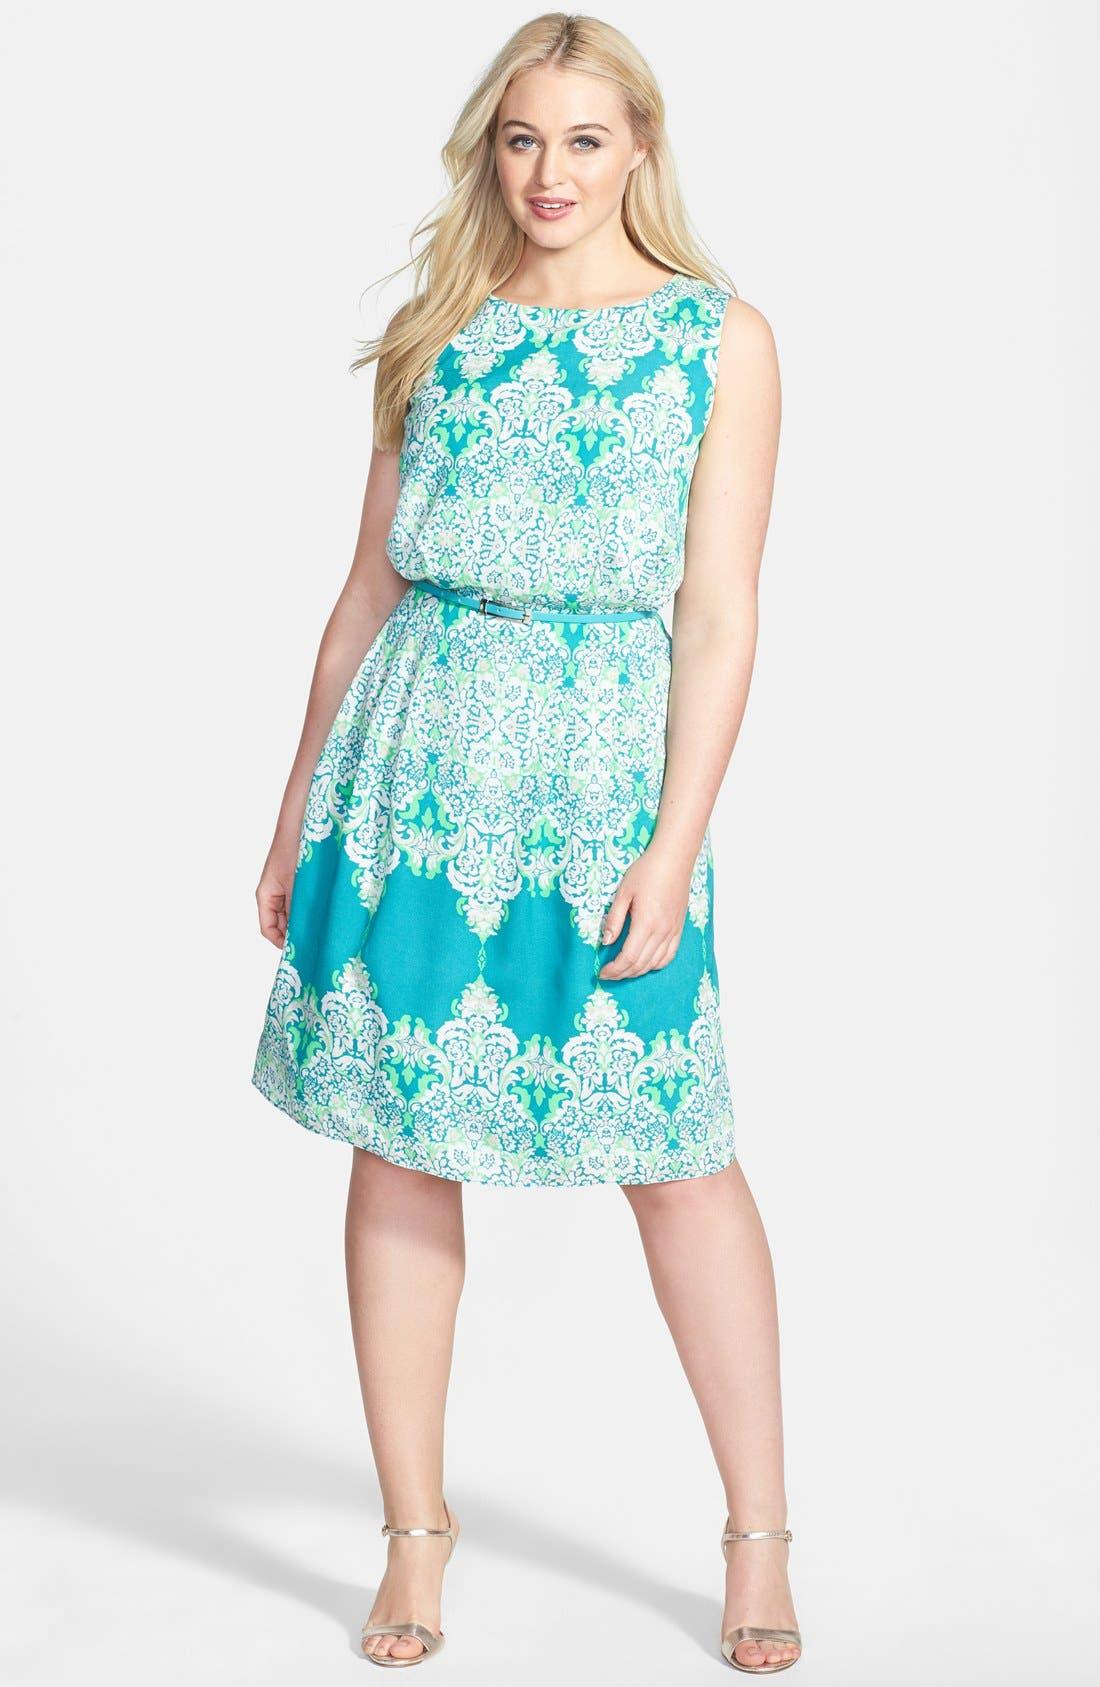 Main Image - Adrianna Papell Print Belted Sleeveless Crêpe de Chine Dress (Plus Size)